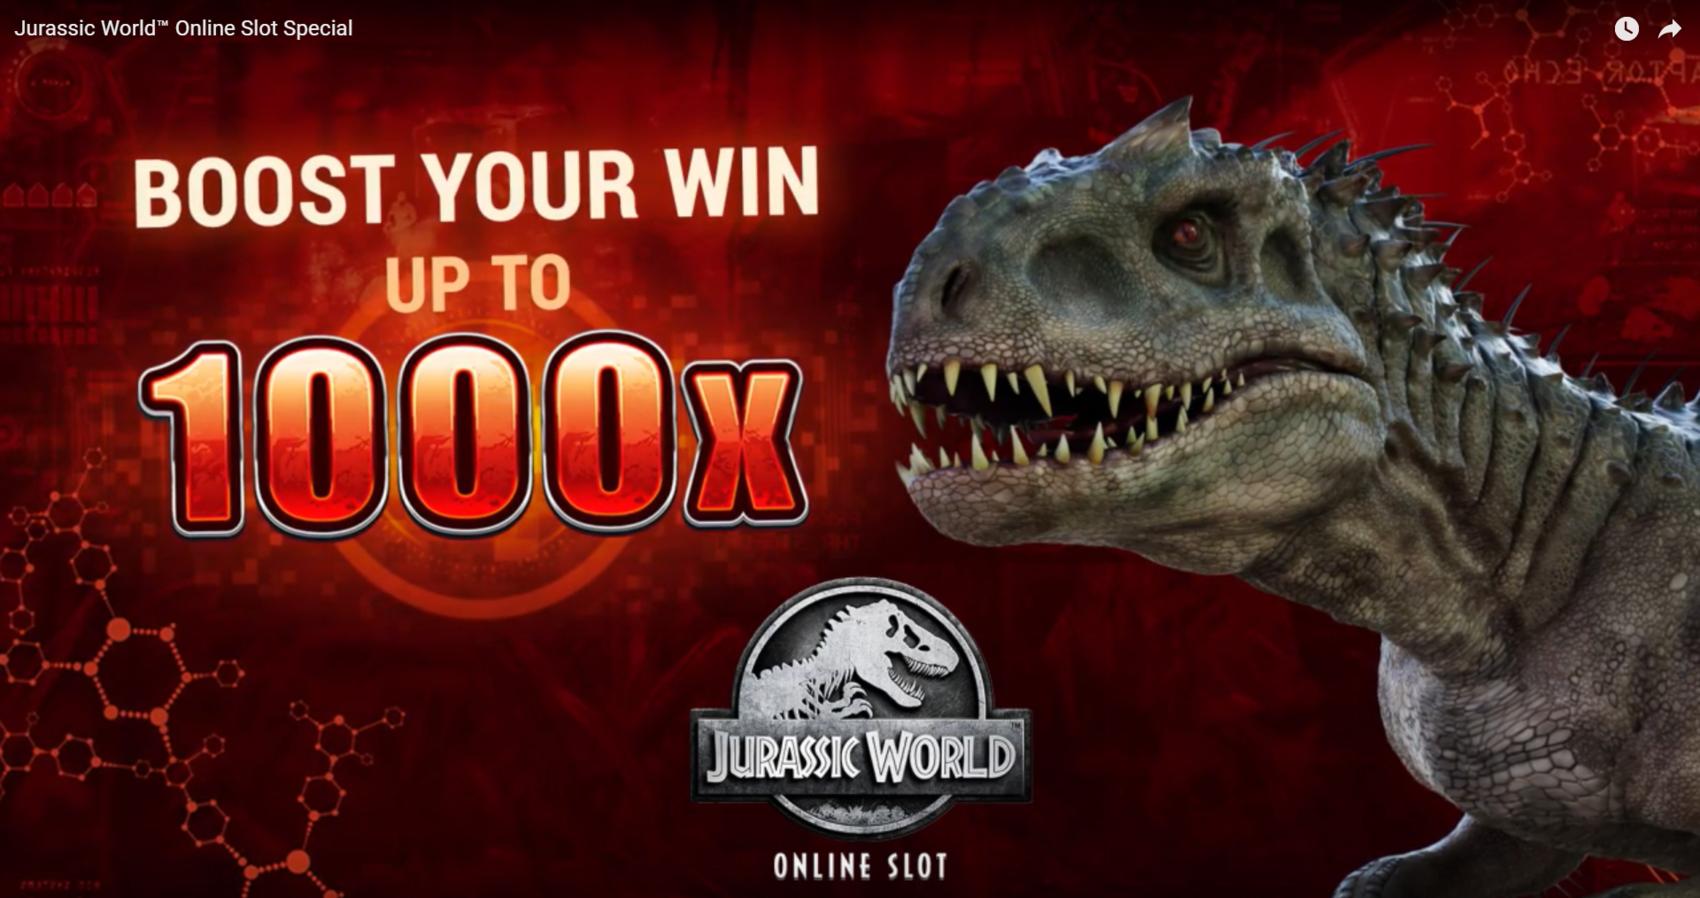 jurassic world slot review  top slots gambleonline